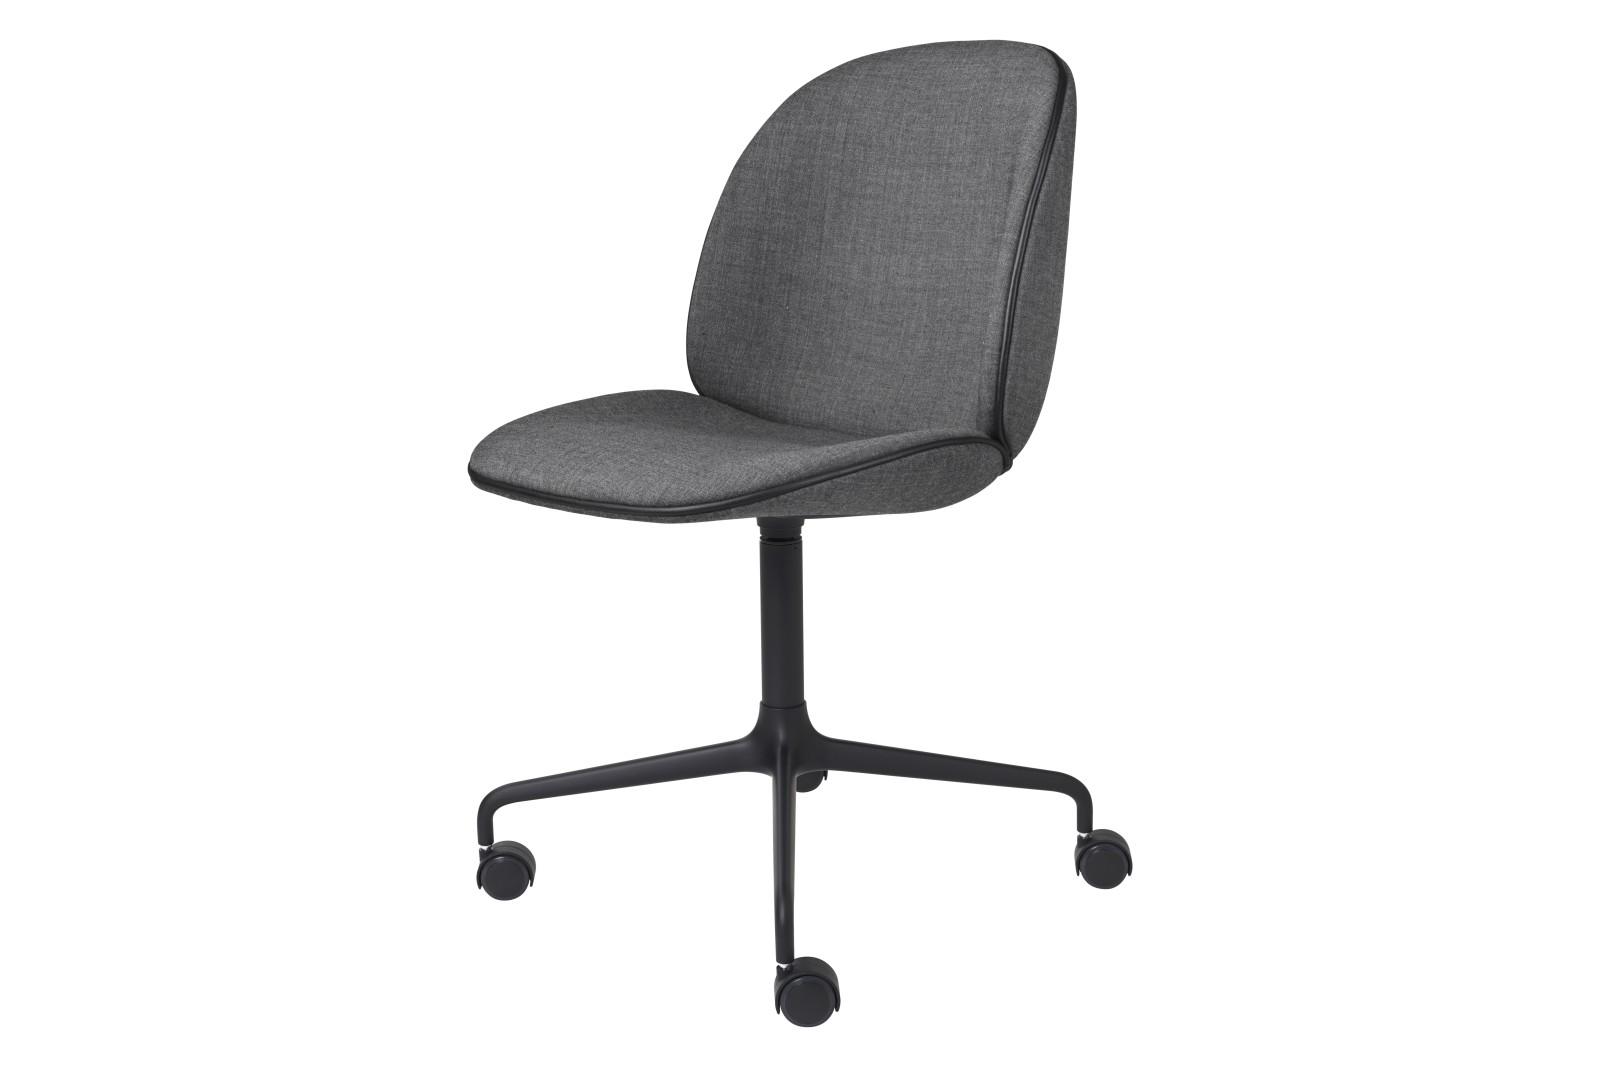 Beetle Meeting Chair - Fully Upholstered, 4-star w. castors Gubi Metal Black, Price Grp. 01